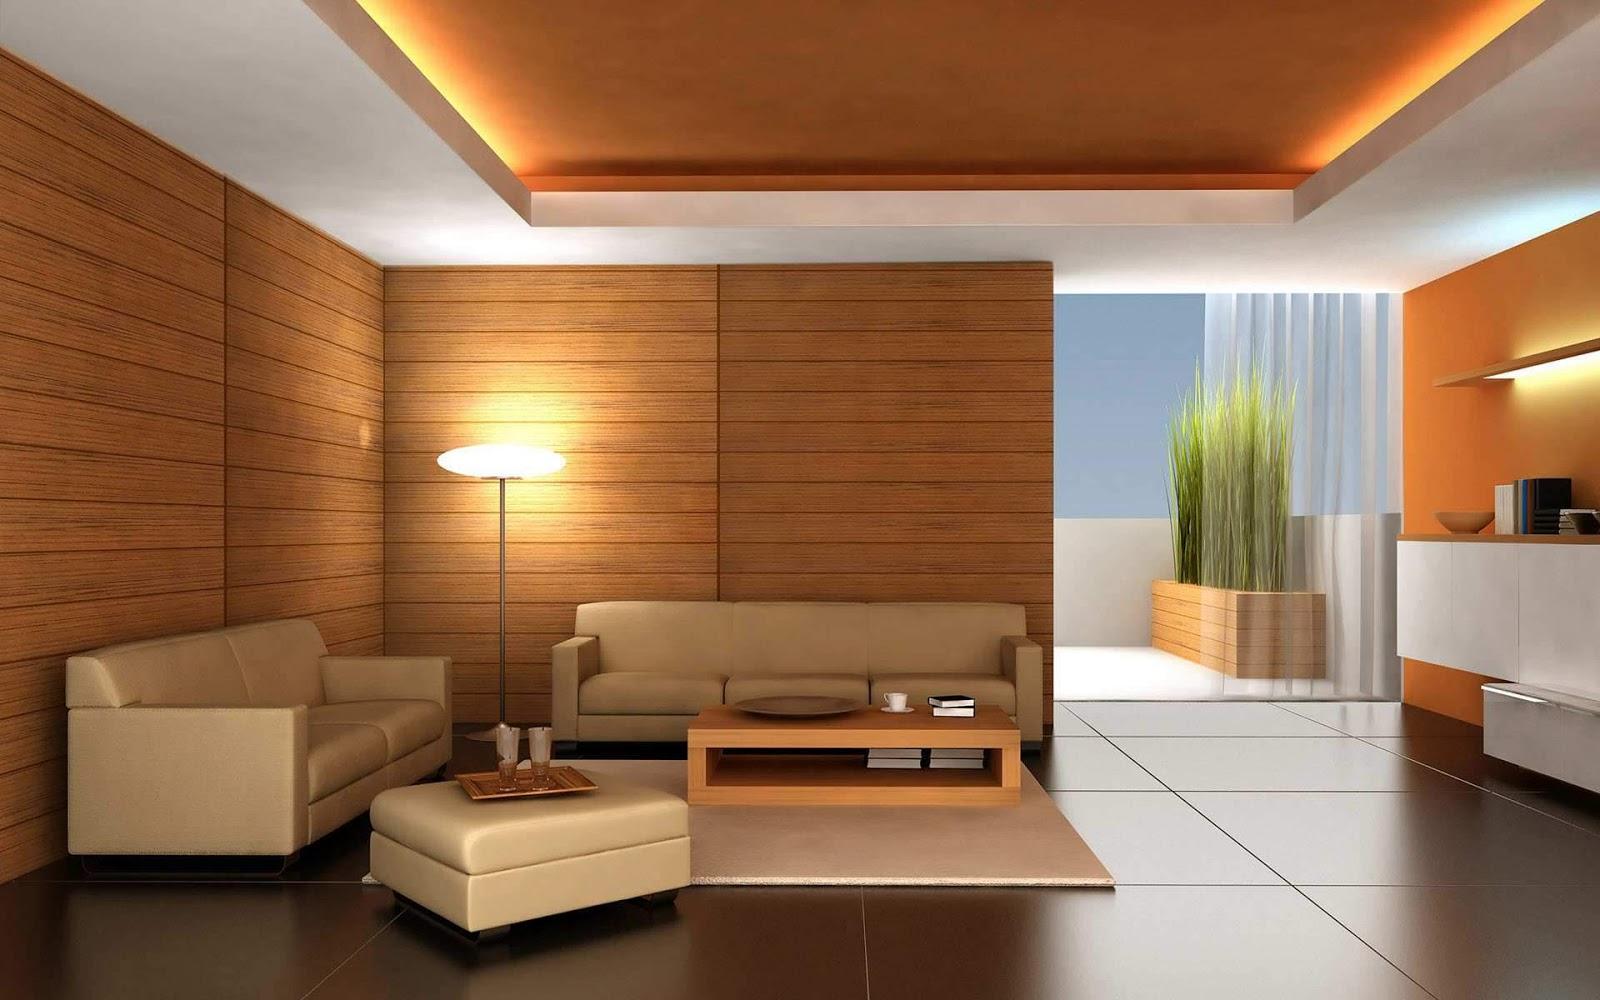 Living Room Home Interior Design Ideas natural living room home interior design ideas decobizzcom stylish ideas